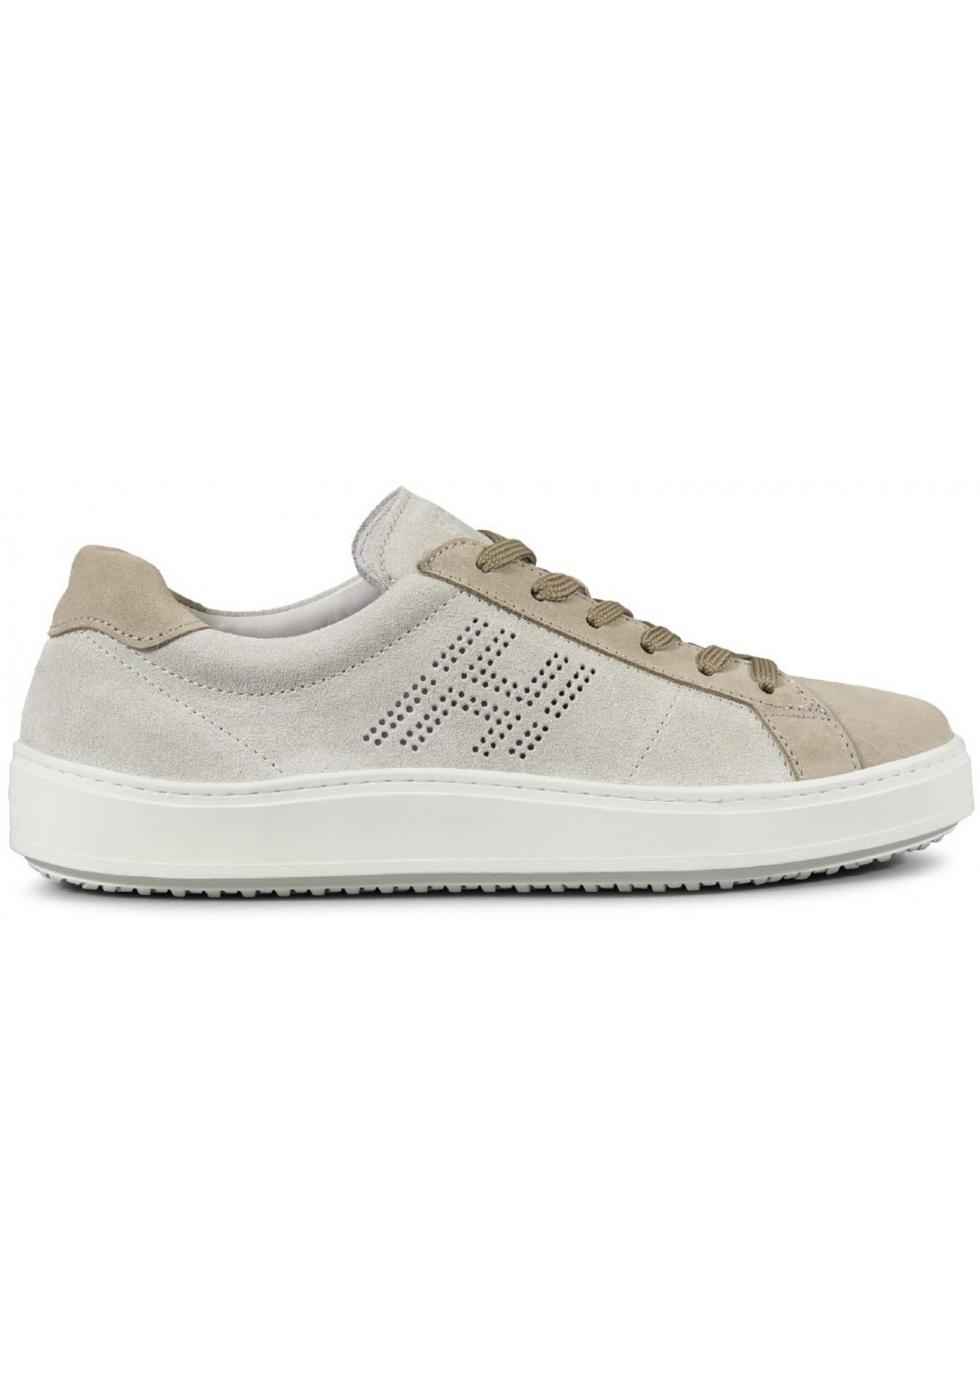 Sneakers Hogan H302 da uomo in suede beige - Italian Boutique